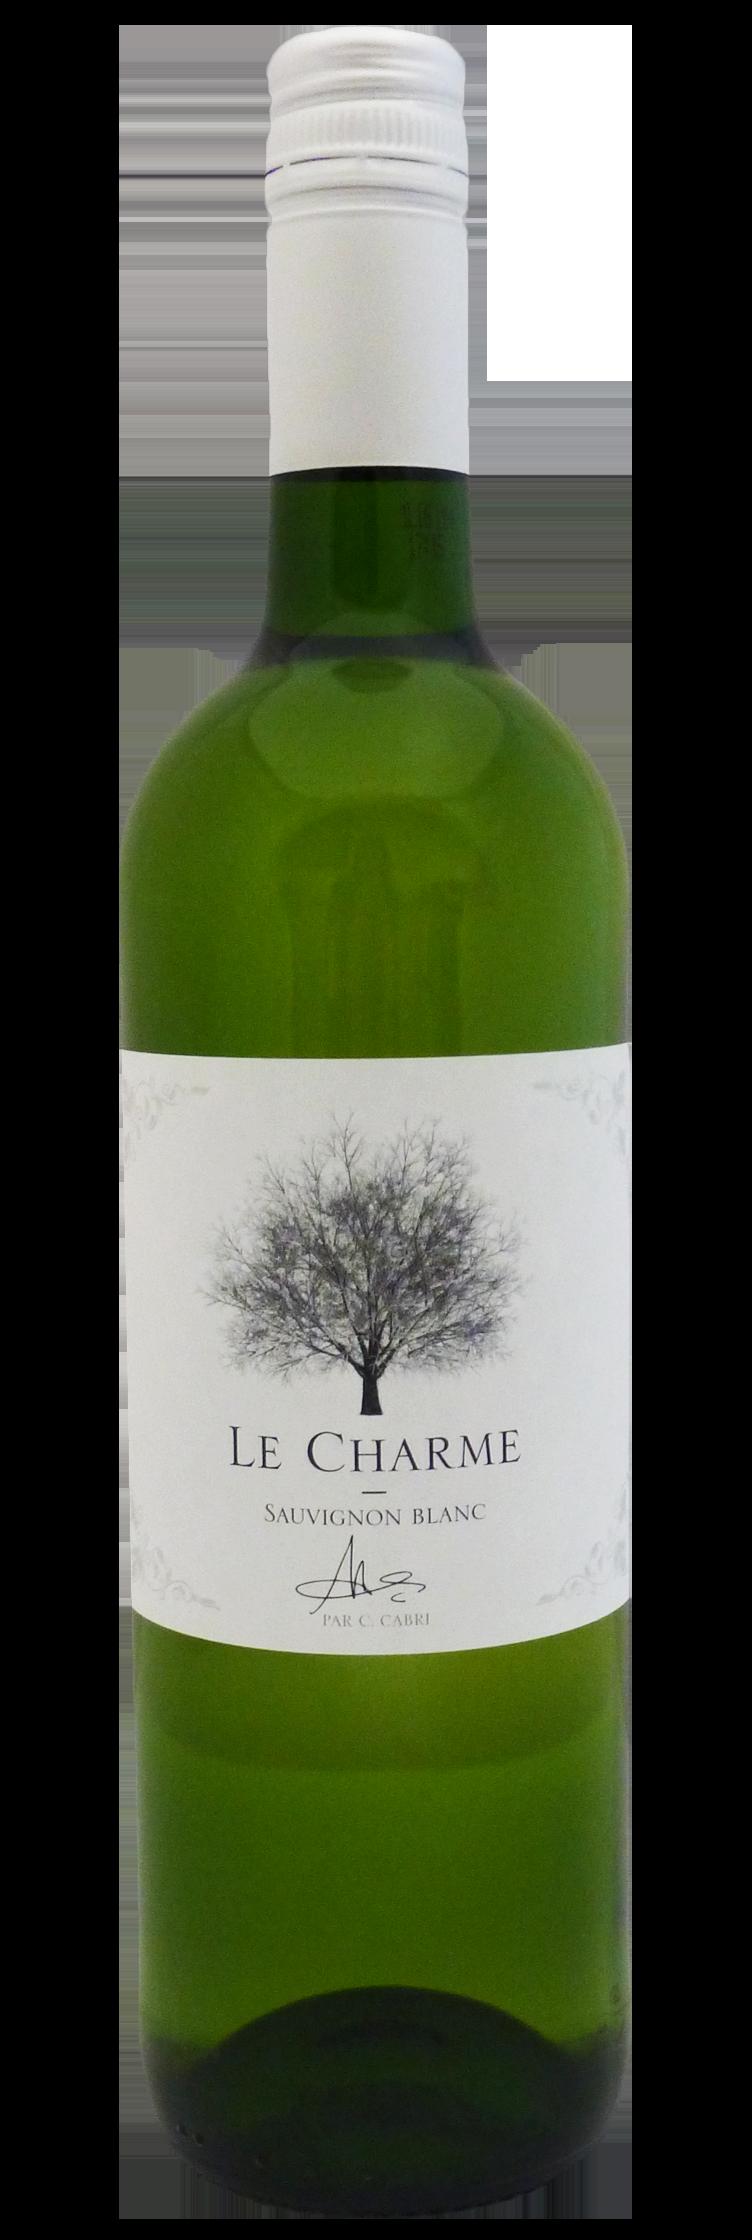 Le Charme Sauvignon Blanc